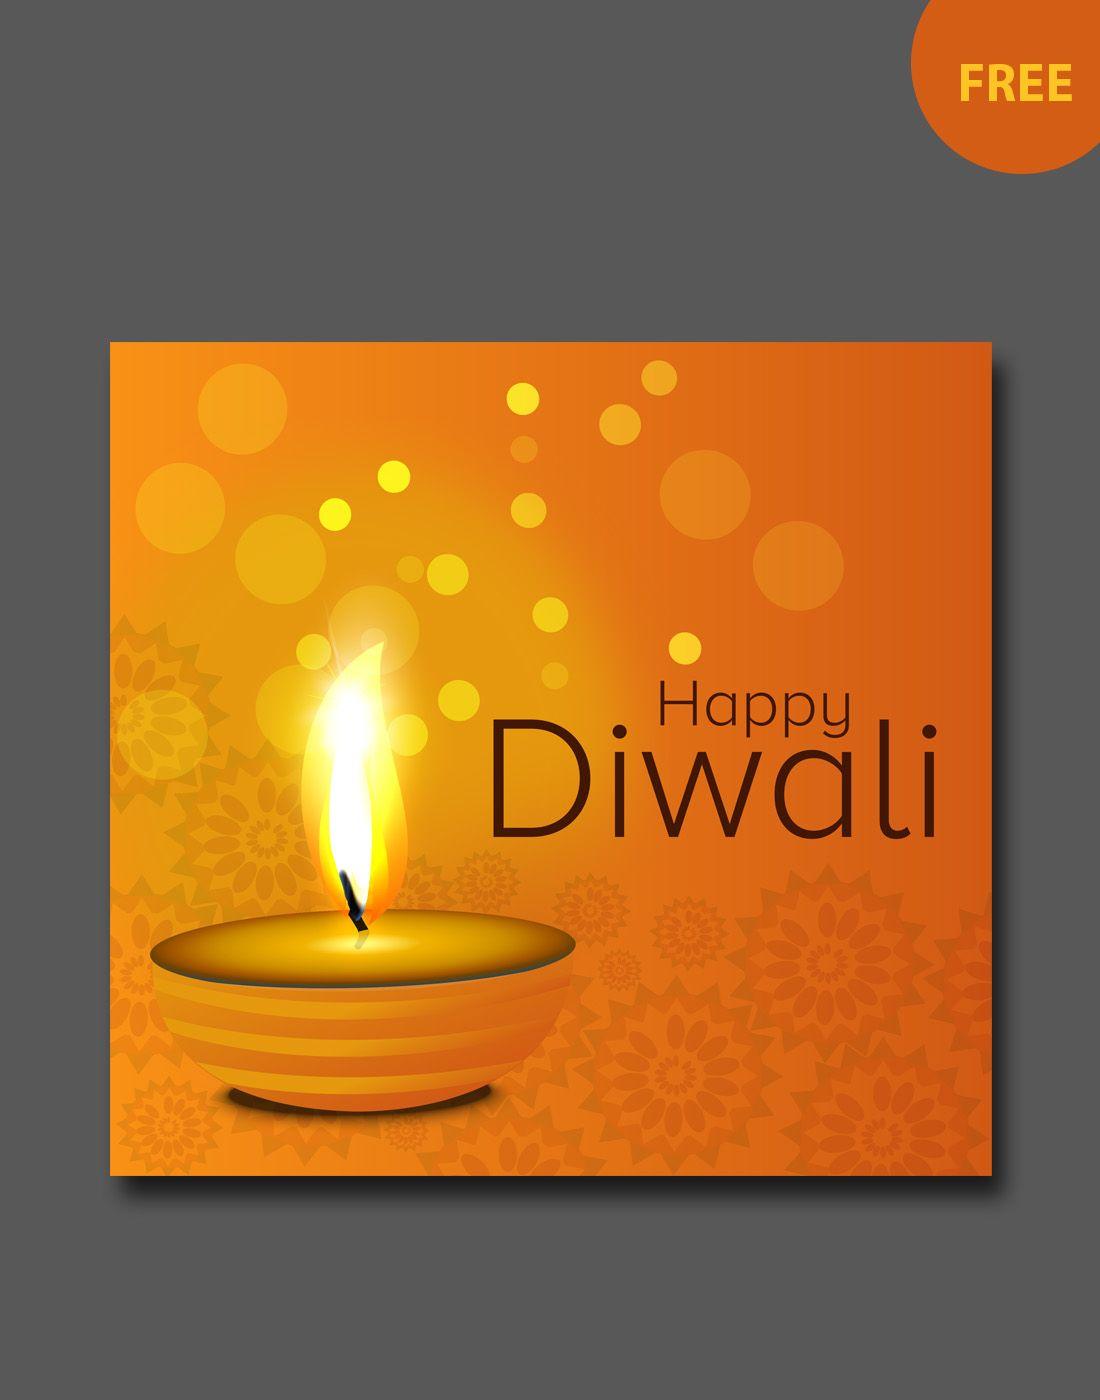 Diwali templates   diwali vector templates   Pinterest   Diwali and ...